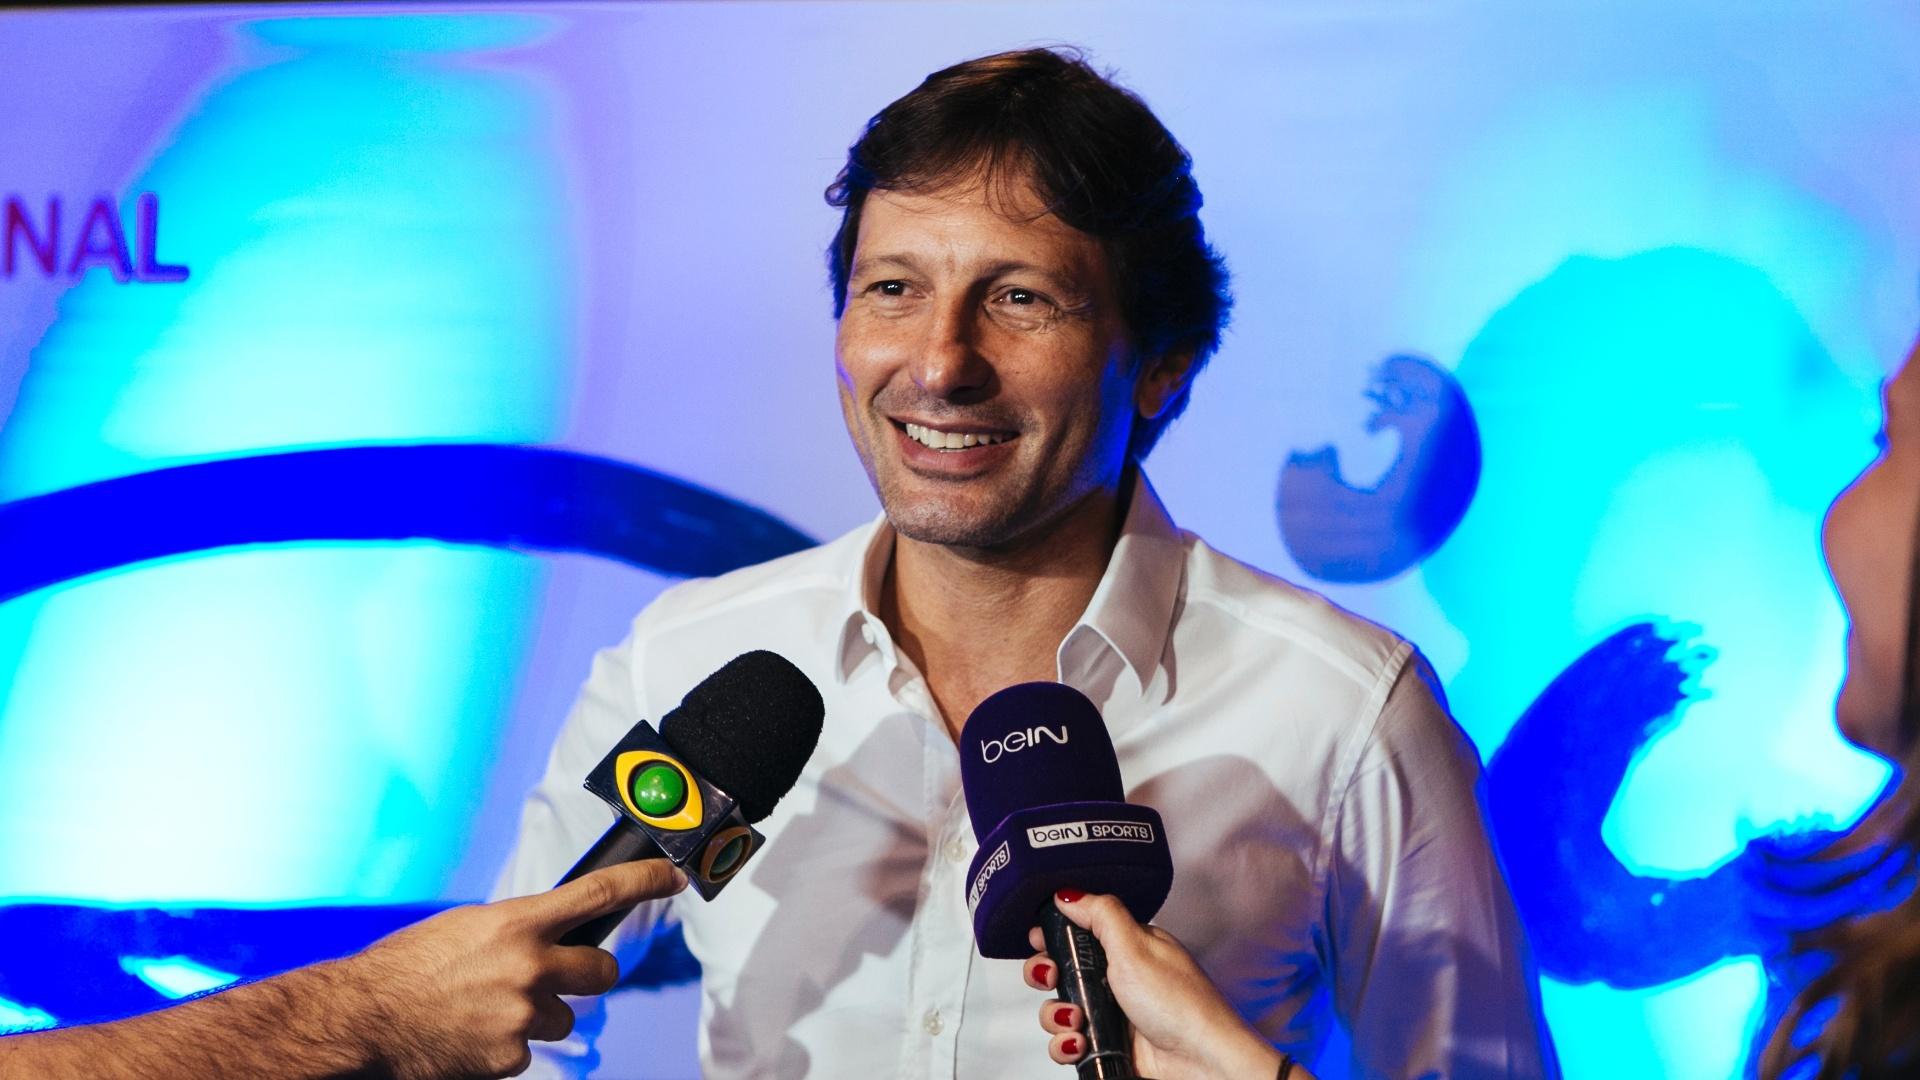 Leonardo concede entrevista durante o lançamento do Canal Zico 10 no YouTube